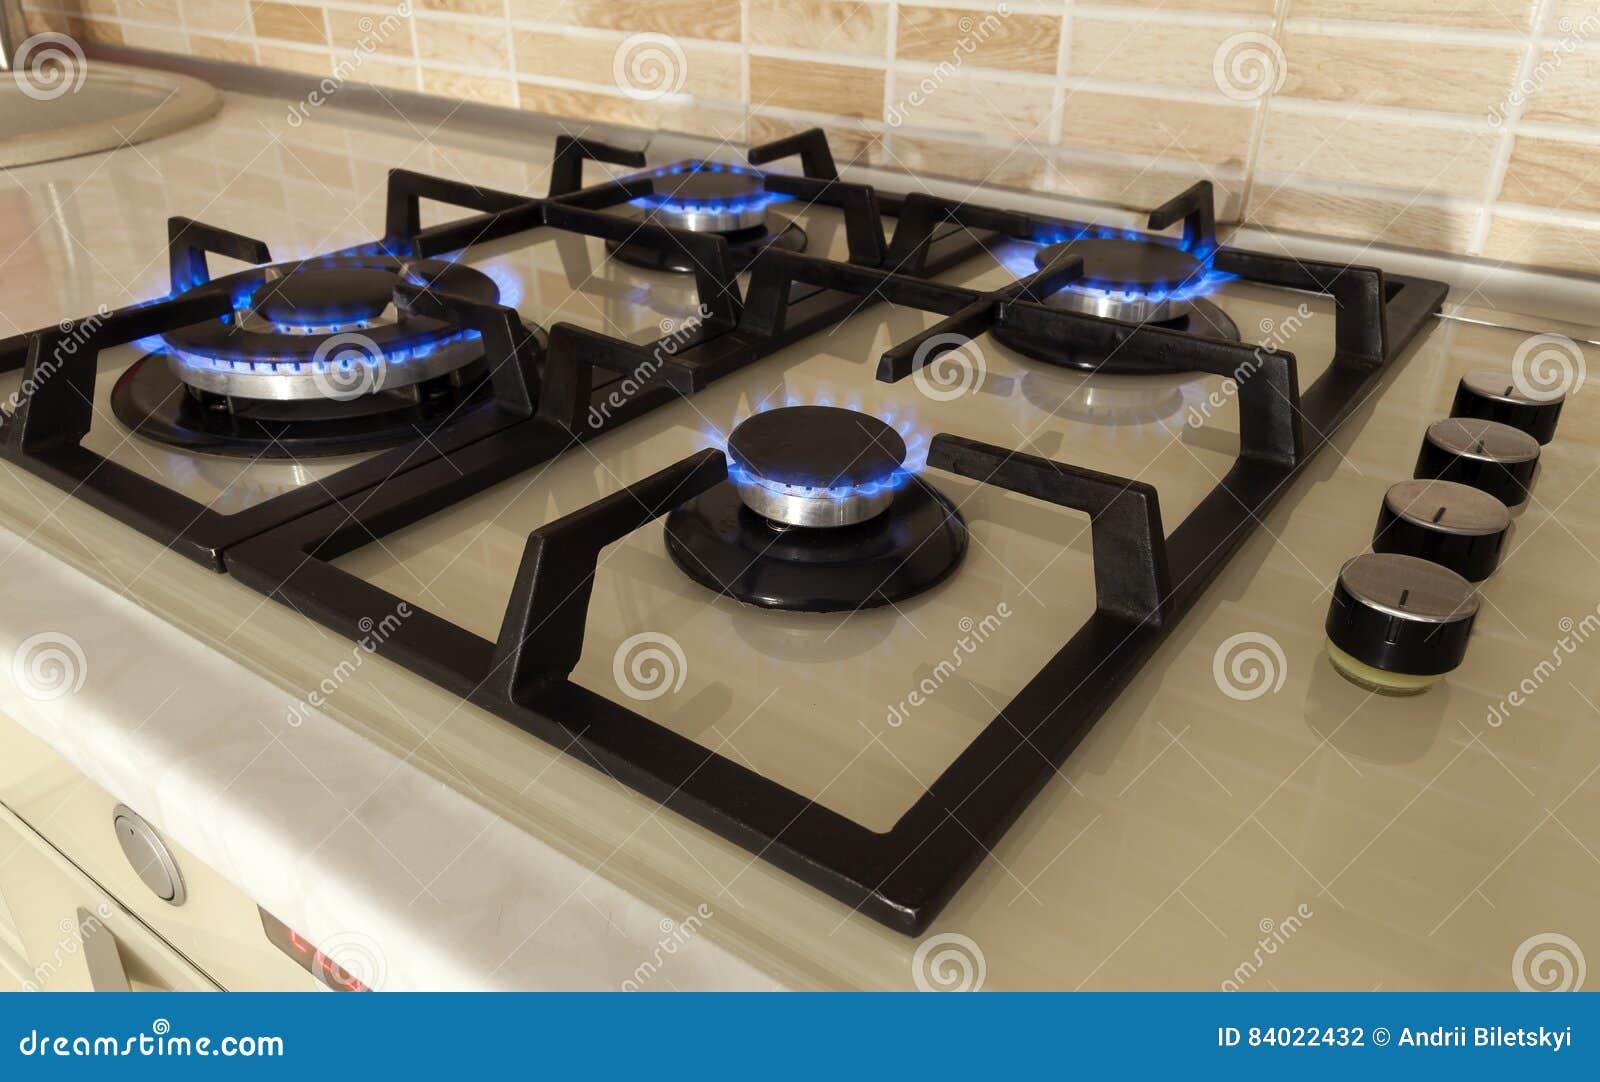 Kitchen Hob Cartoon ~ Methane flames at kitchen cooker royalty free stock photo